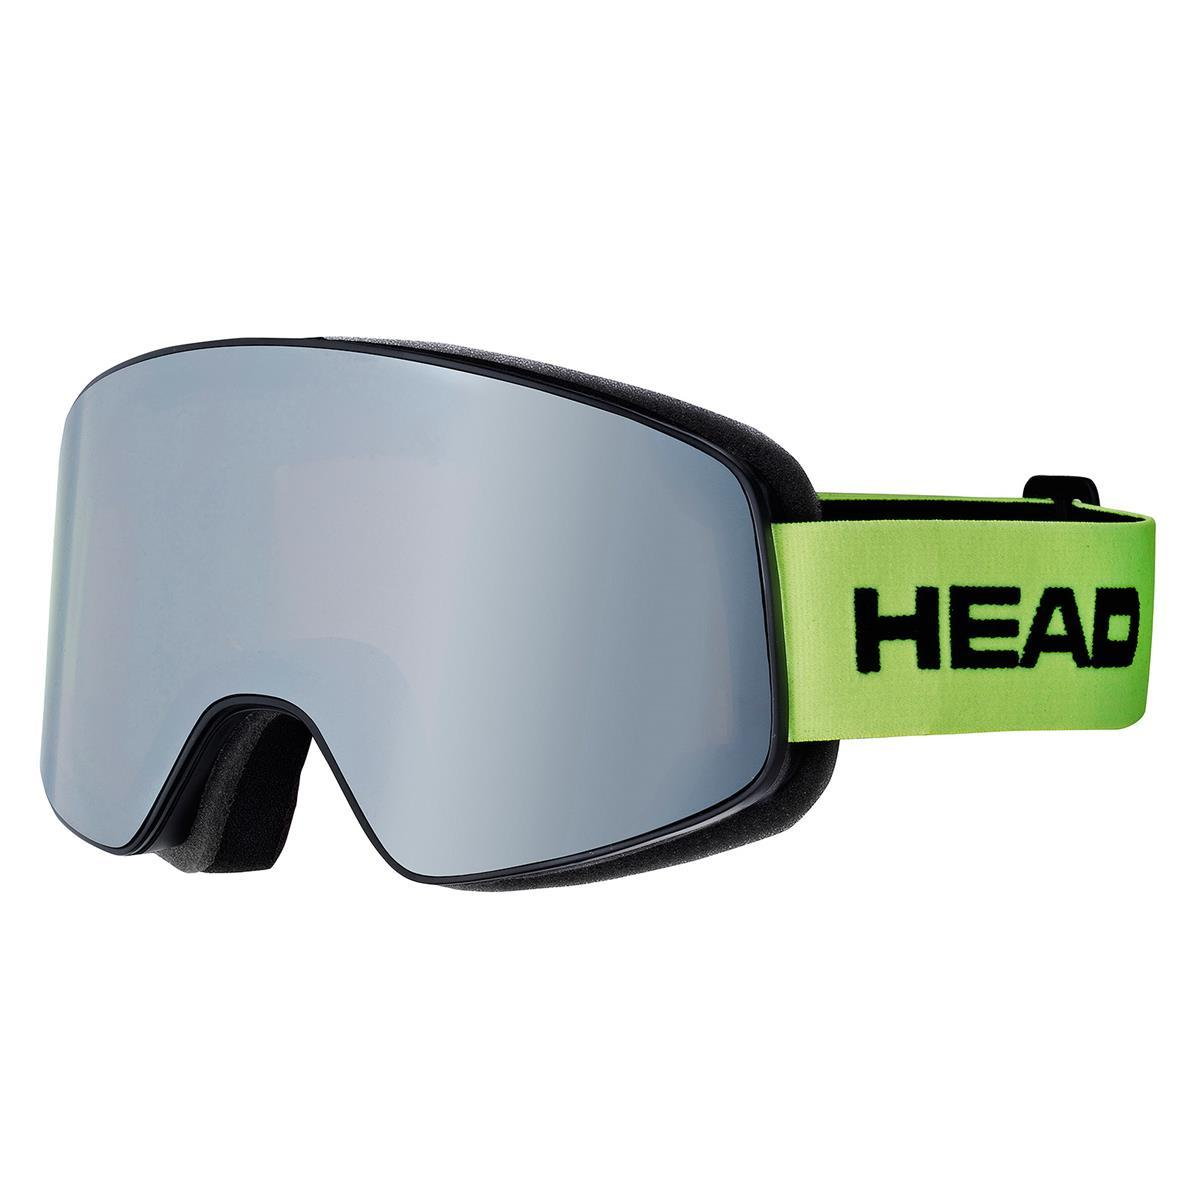 Head Horizon Race + SpareLens 97386ed86e6